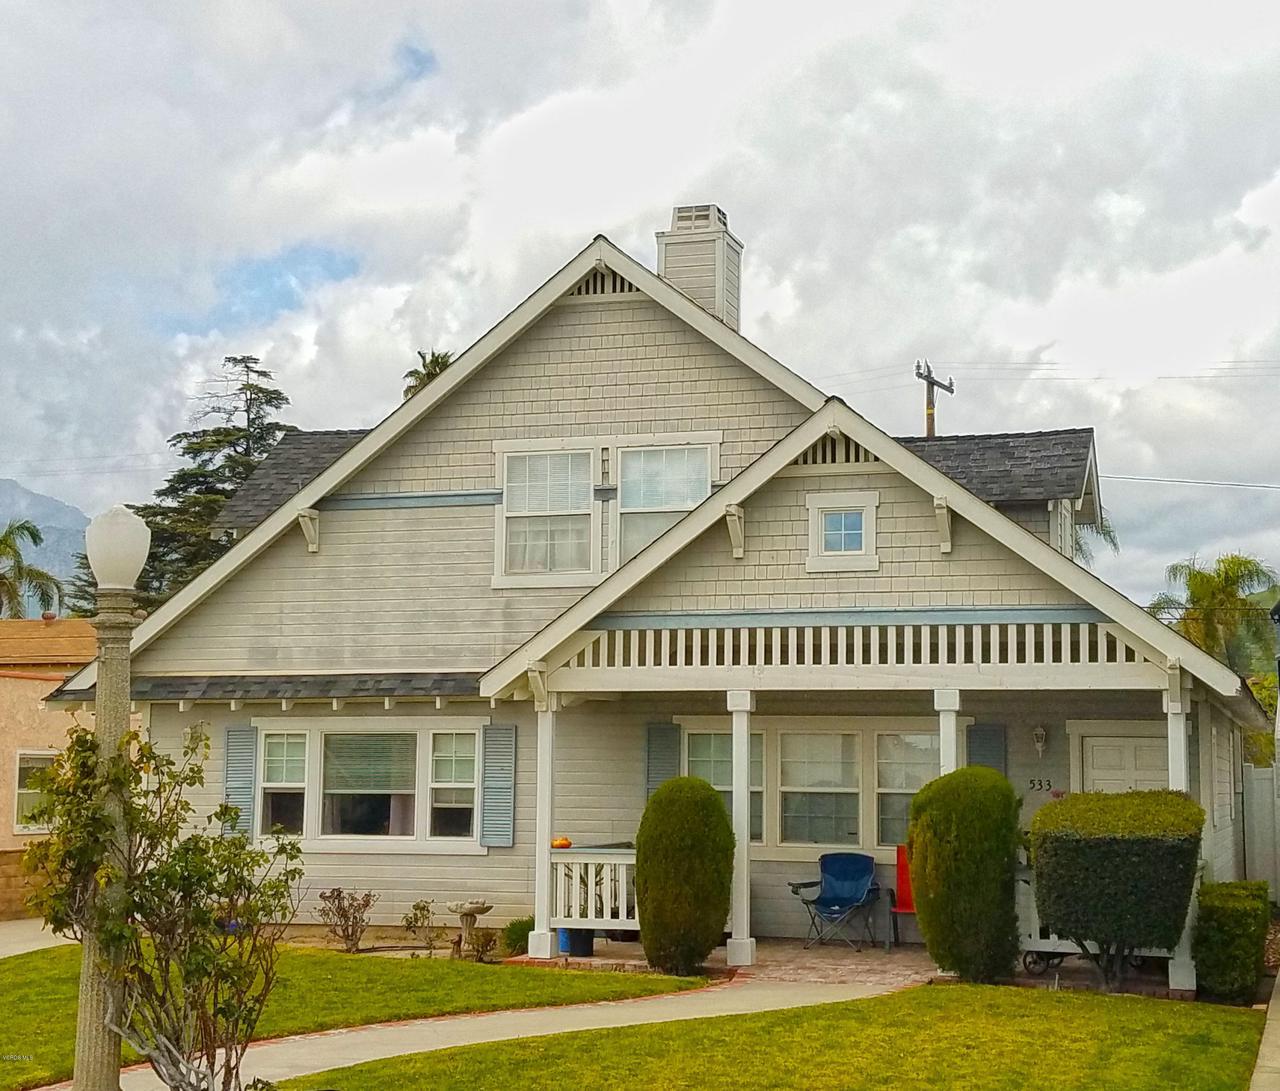 533 KENSINGTON, Fillmore, CA 93015 - 533 Kensington Drive